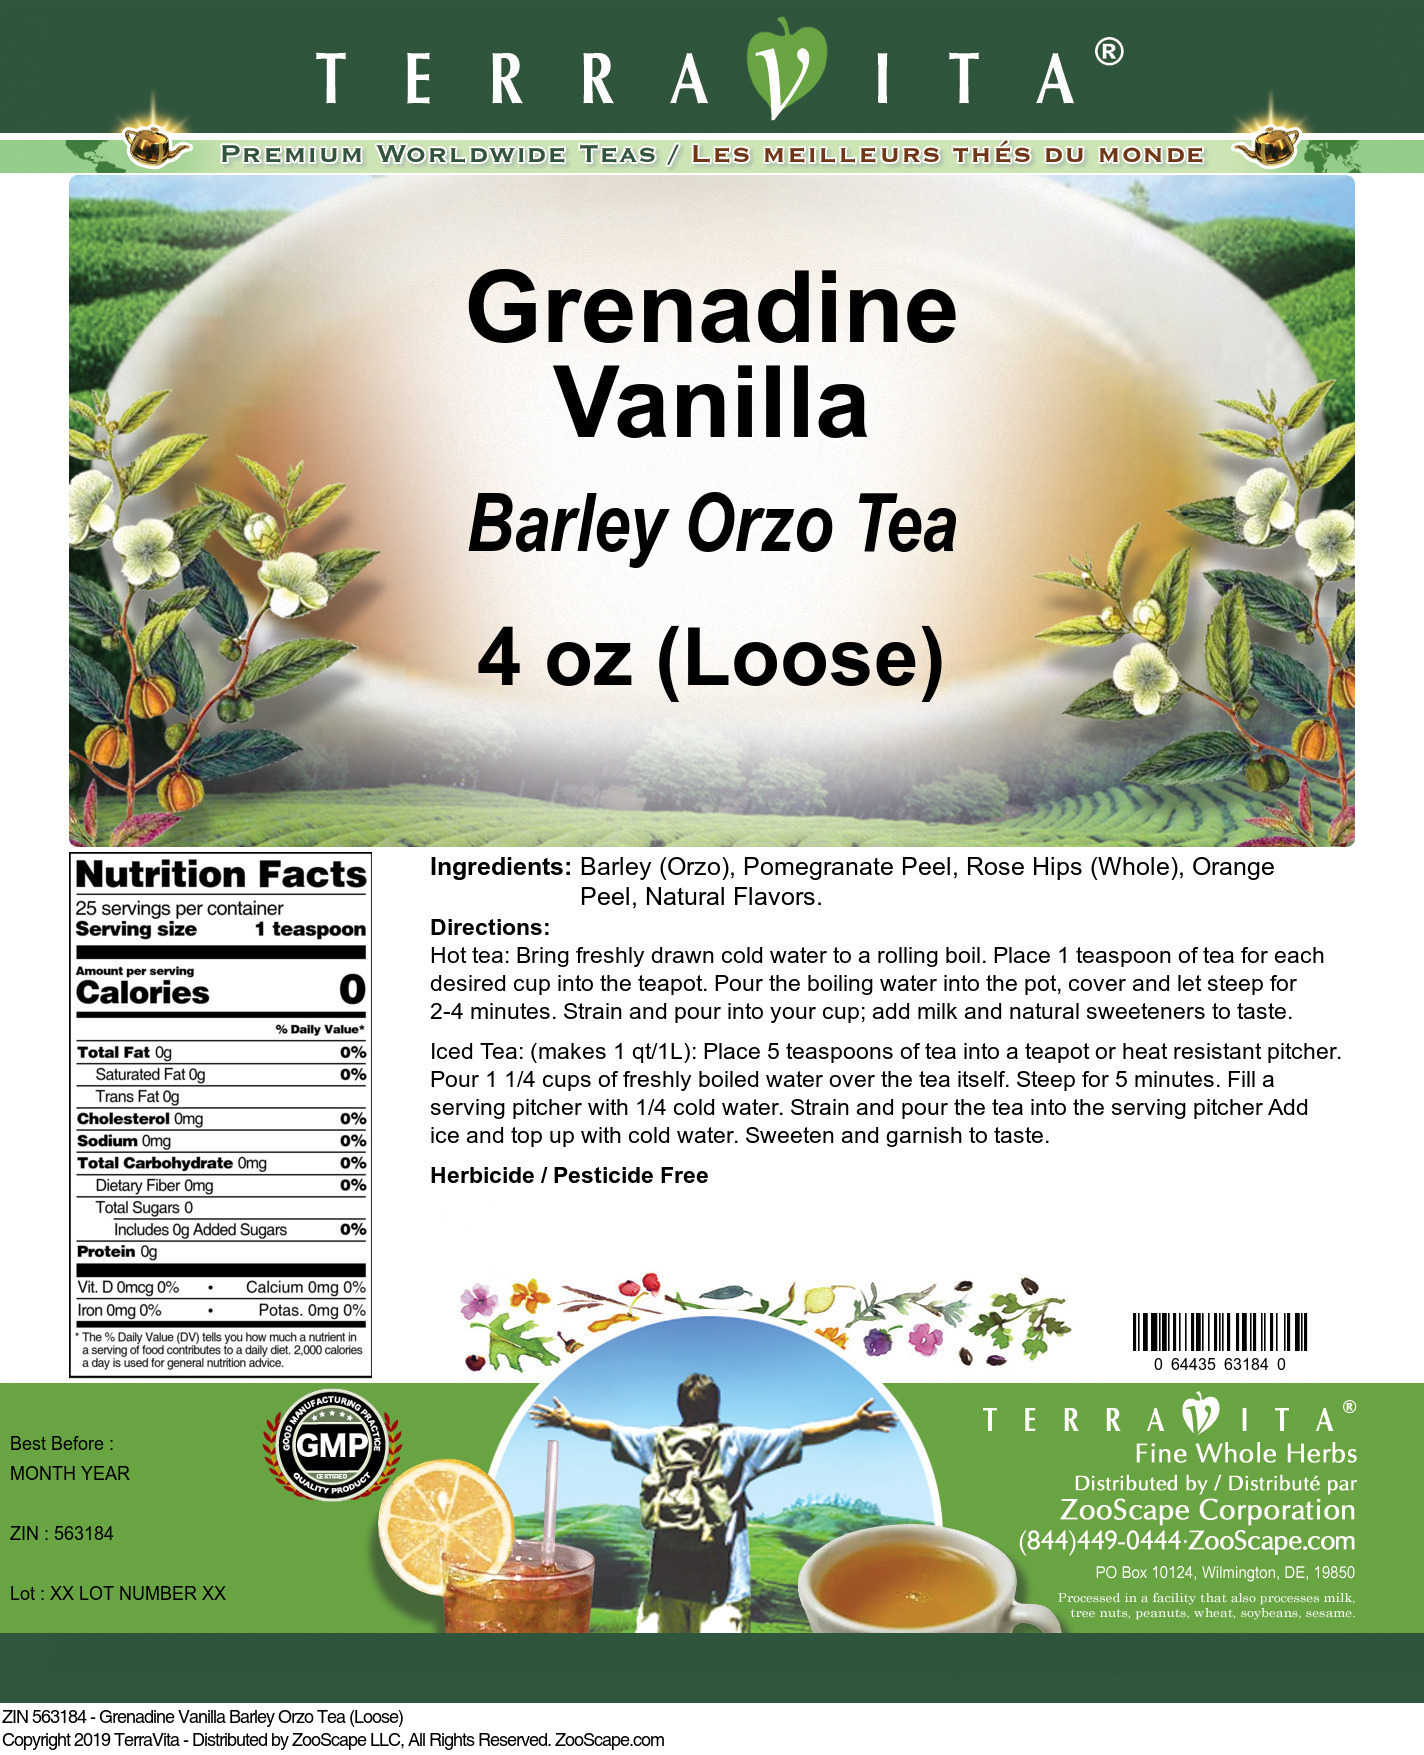 Grenadine Vanilla Barley Orzo